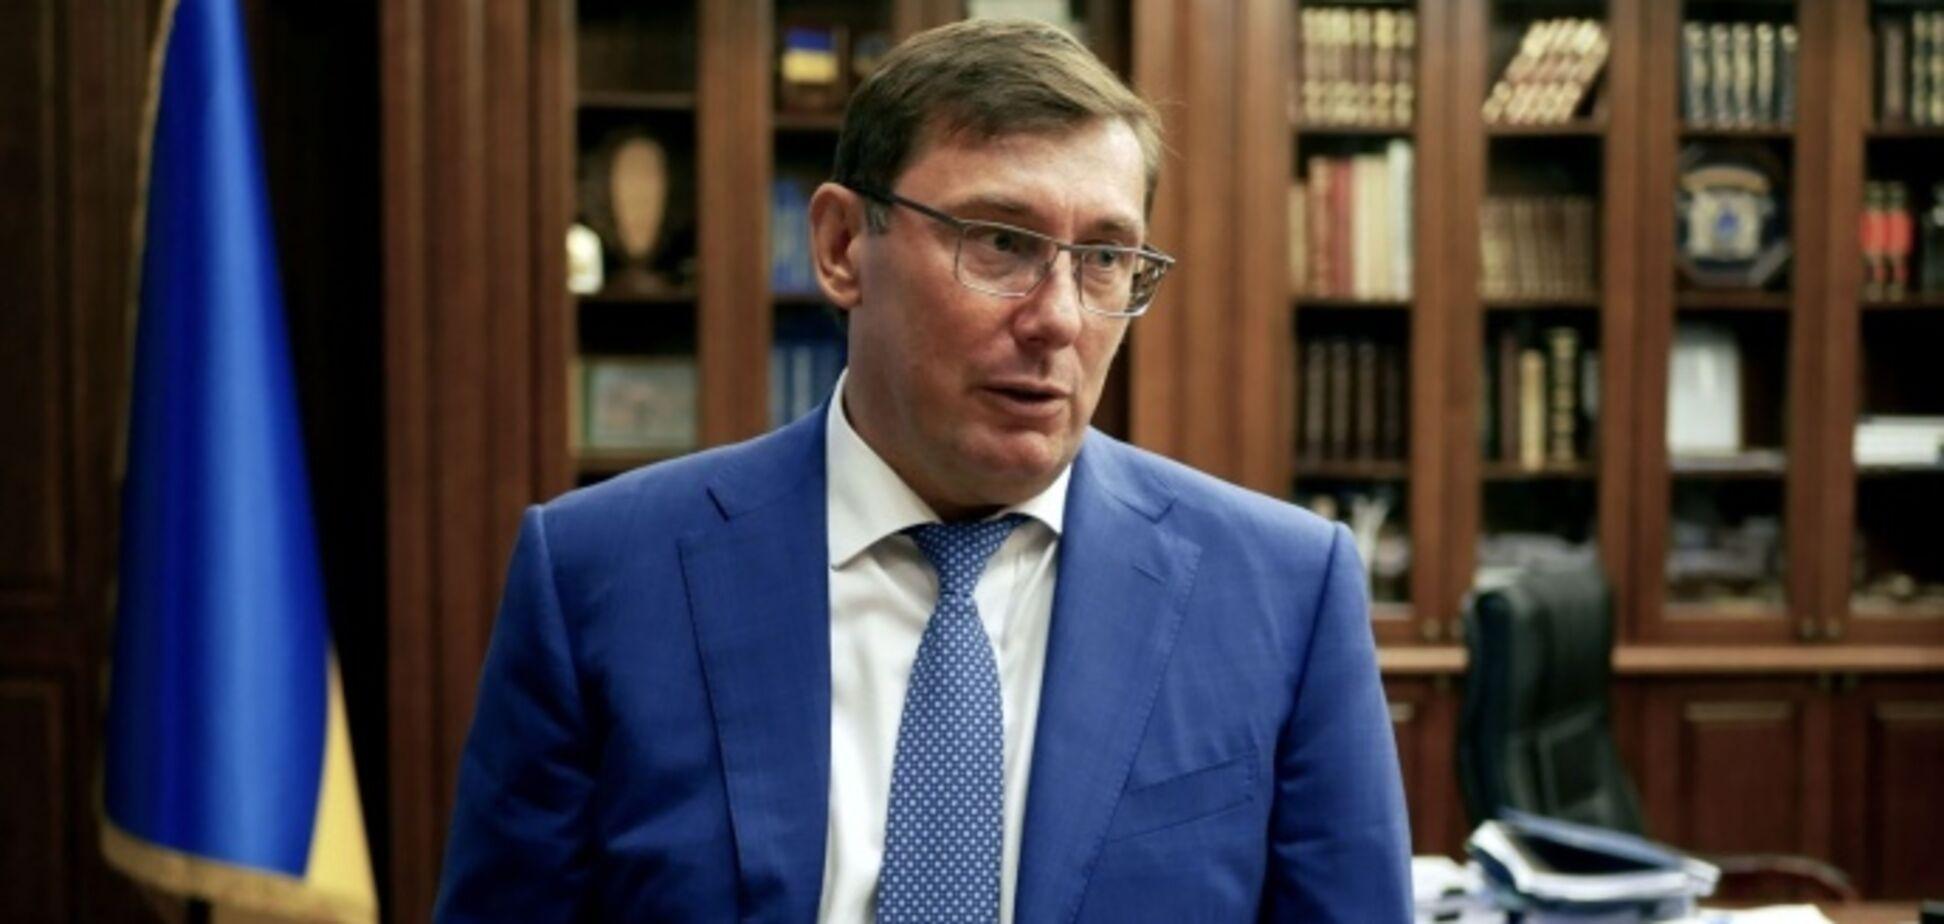 'Сто тисяч тонн!' Луценко приголомшив масштабами контрабанди на популярному ринку Одеси